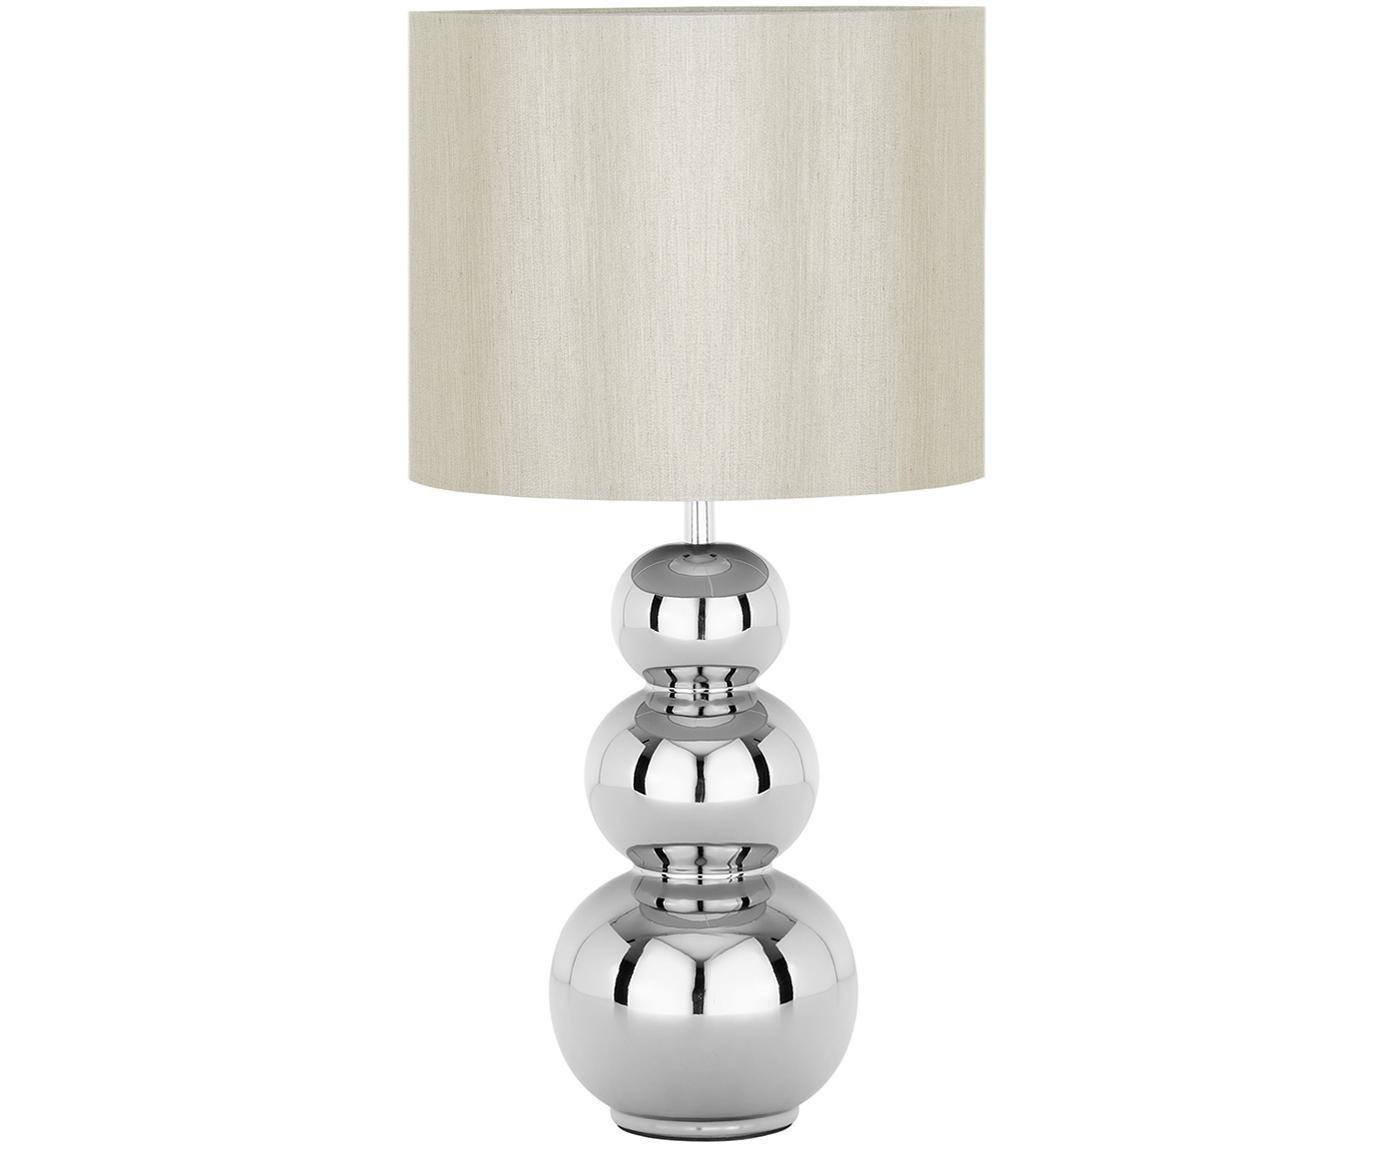 Keramik-Tischleuchte Regina, Lampenschirm: Textil, Lampenfuß: Keramik, Taupe, Chrom, Ø 25 x H 49 cm